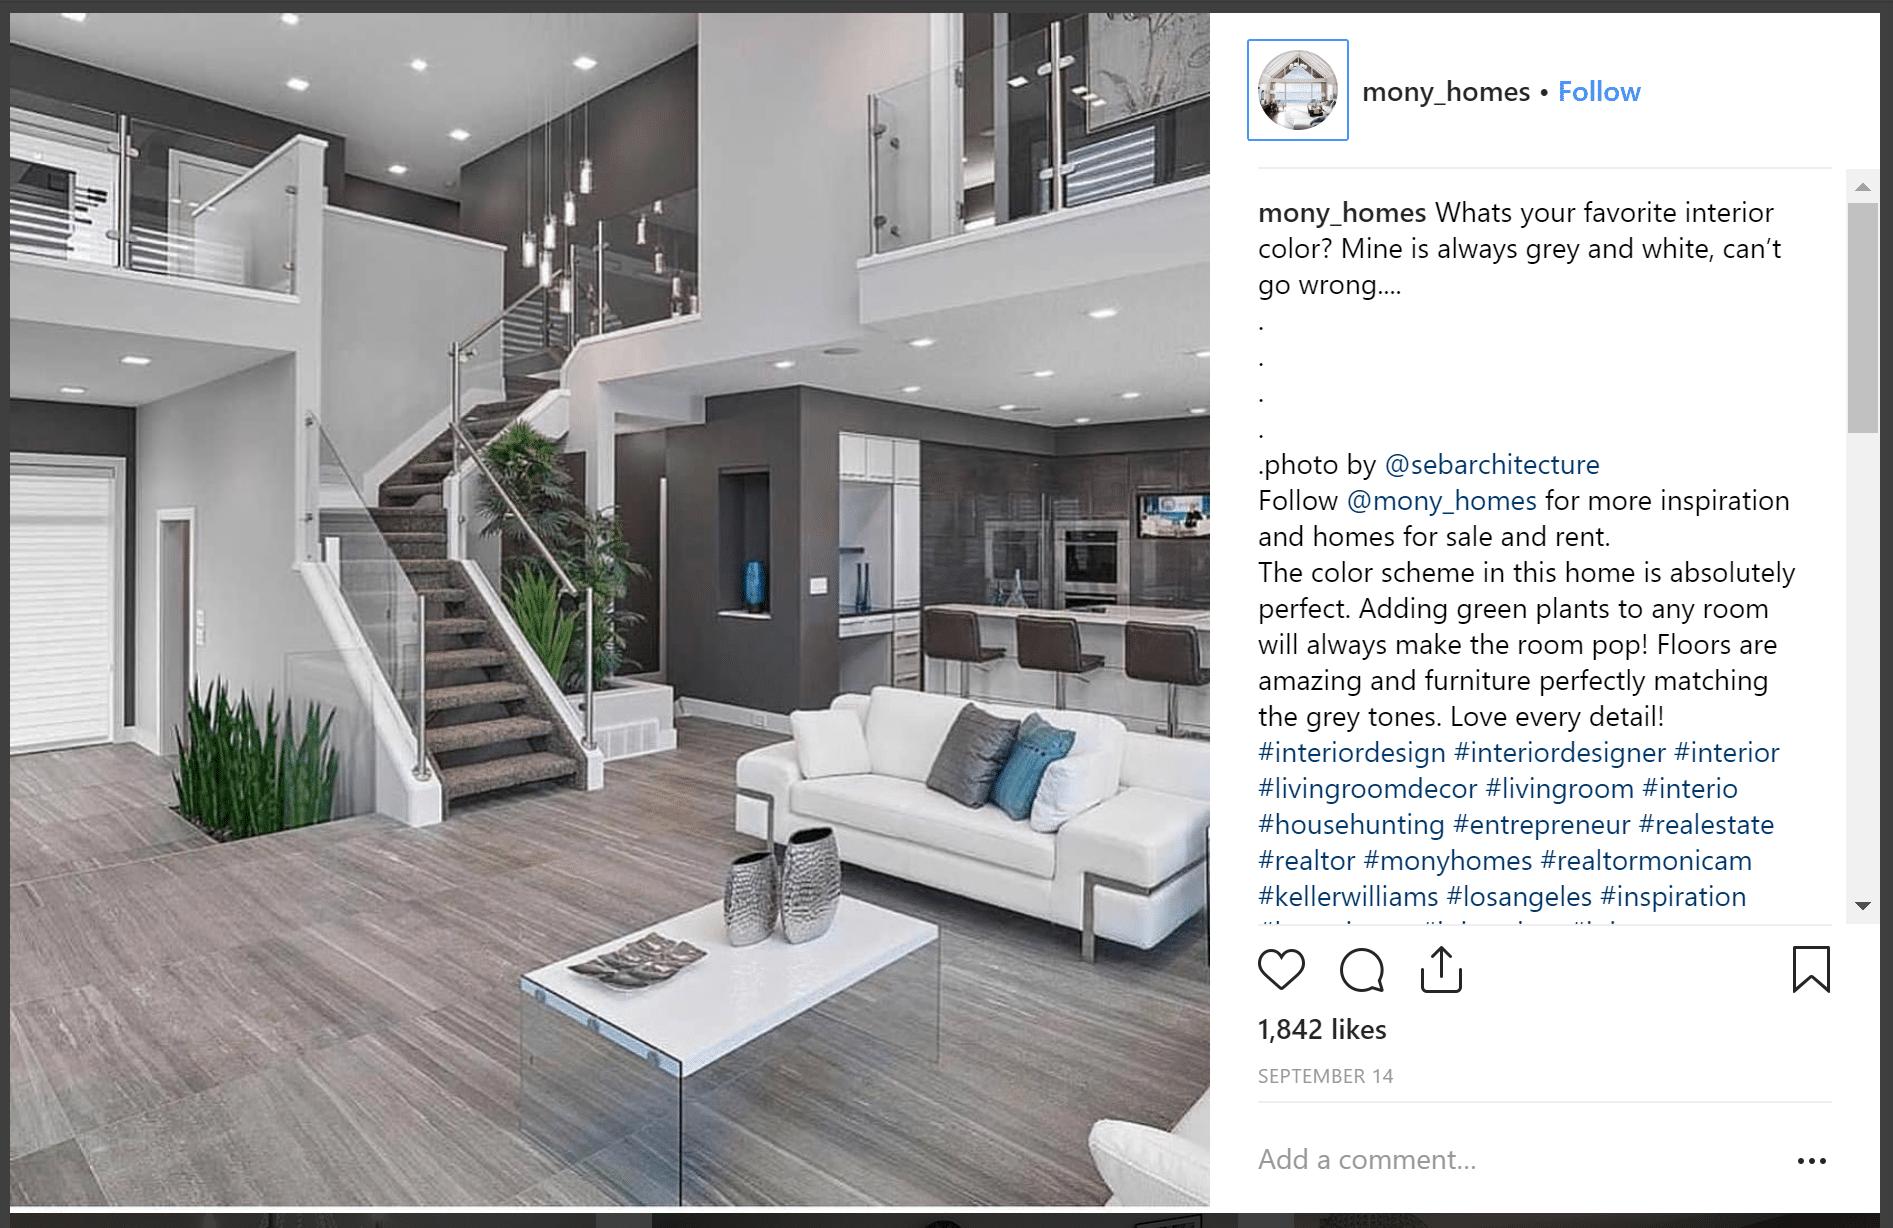 instaheavy design hashtags